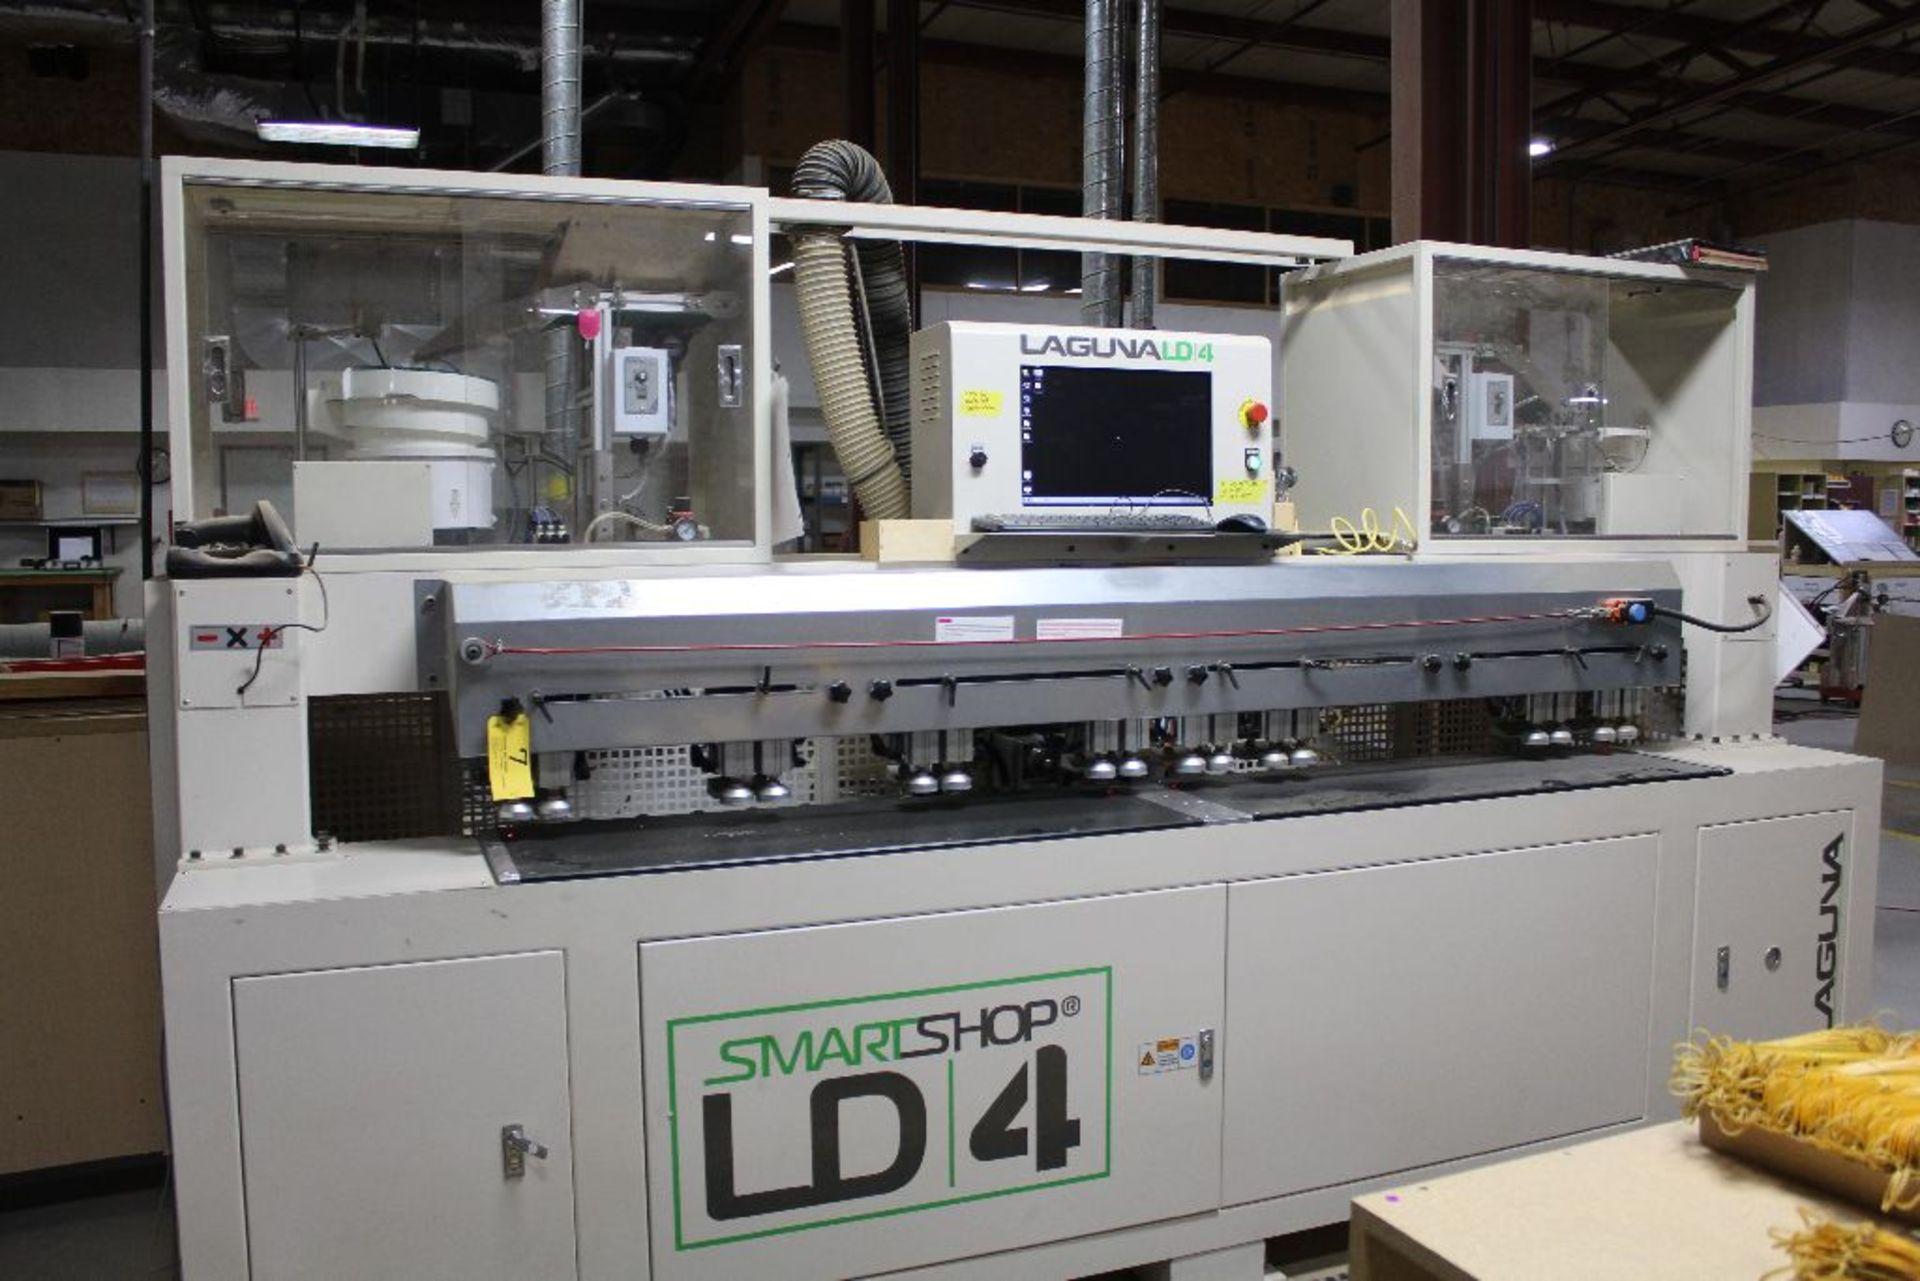 "Lot 007 - Laguna LD 4 Smartshop horz. Boring, dowel machine, sn 00100, M06930, table size 48"" x 16""."